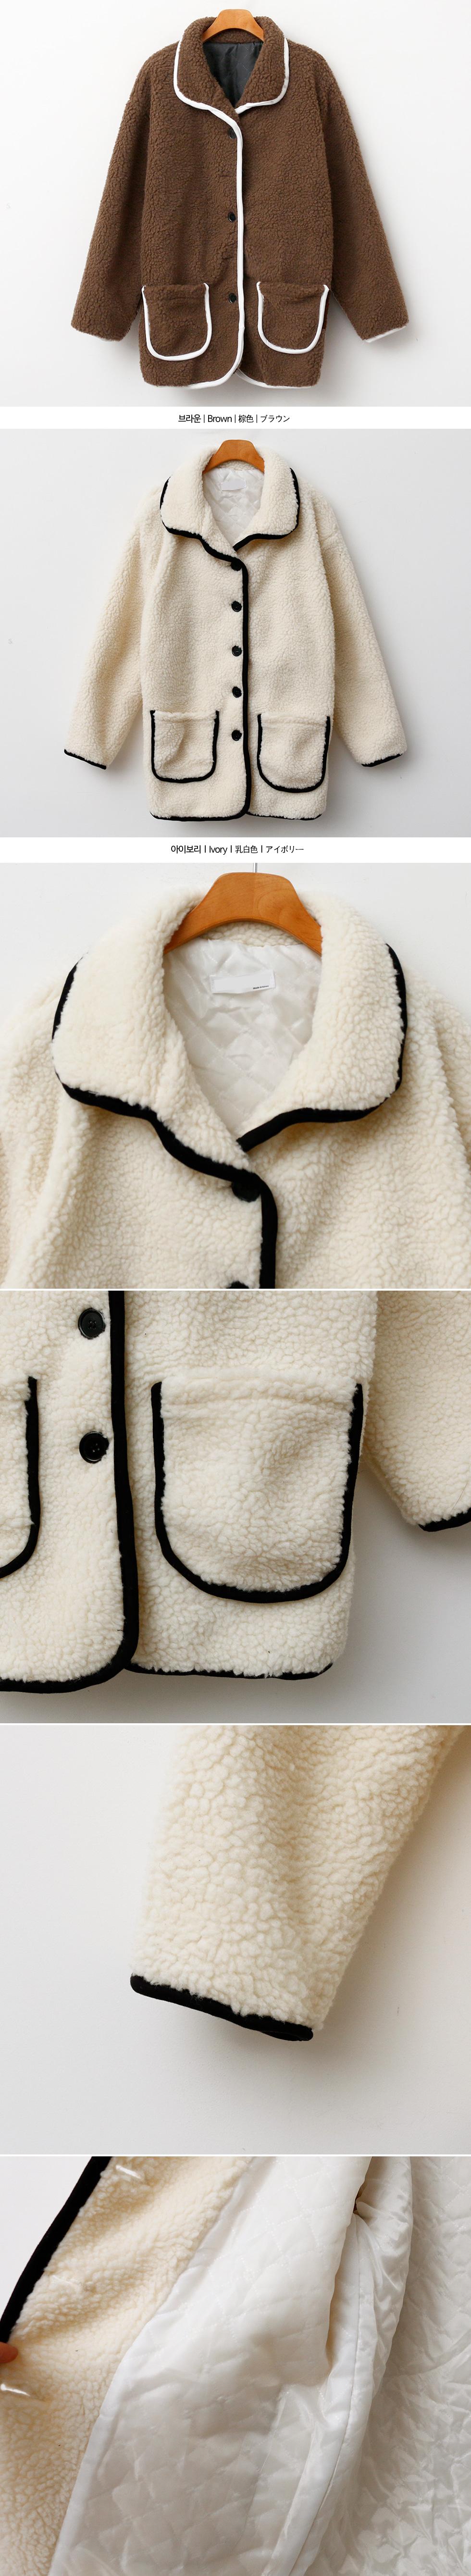 Valenline Po Jacket